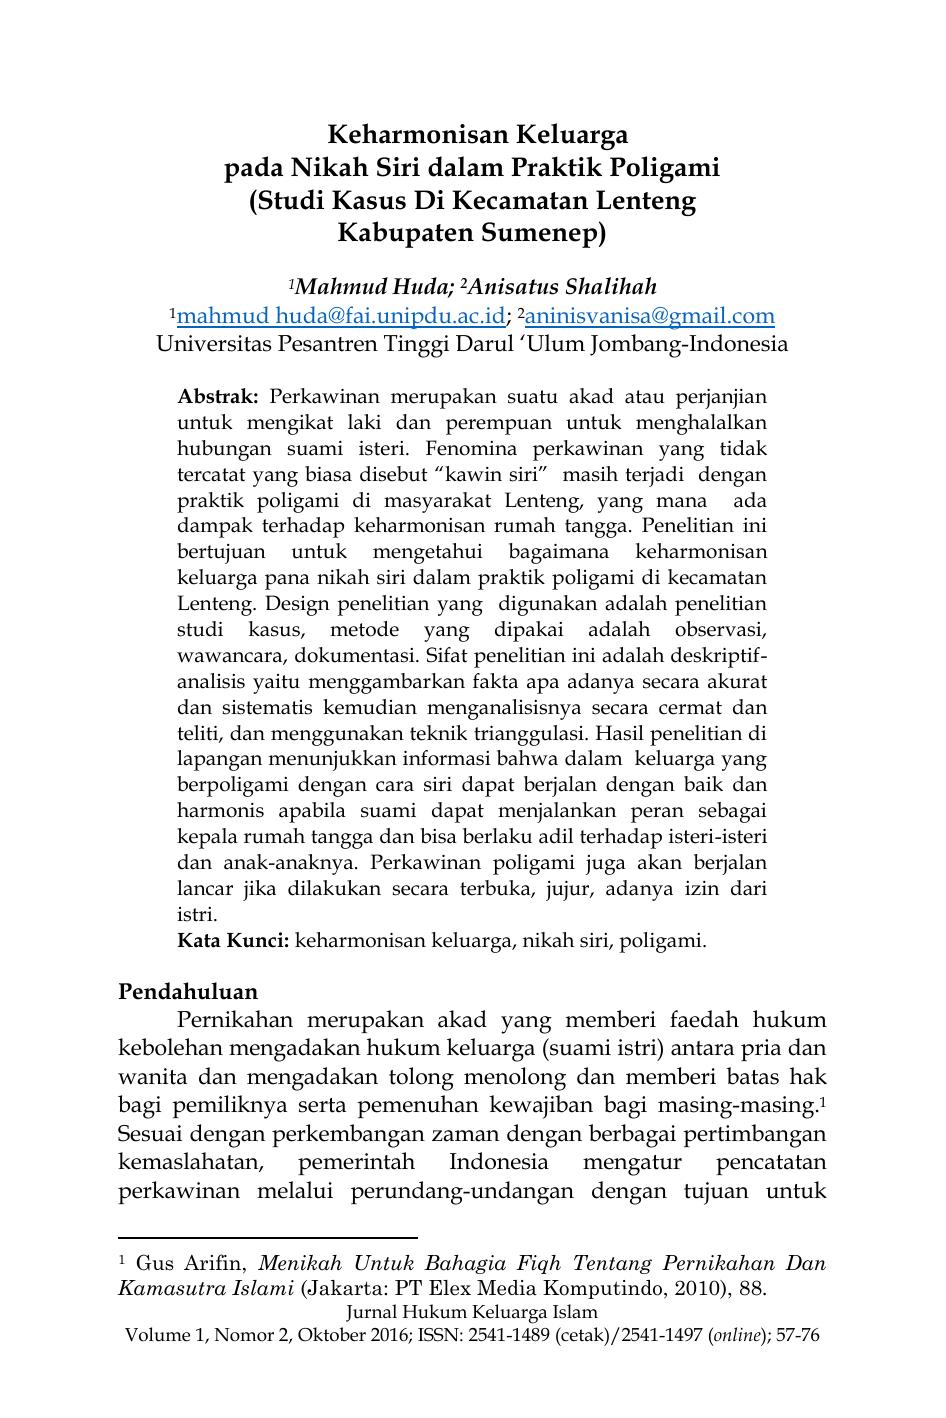 Keharmonisan Keluarga Pada Nikah Siri Dalam Praktik Poligami